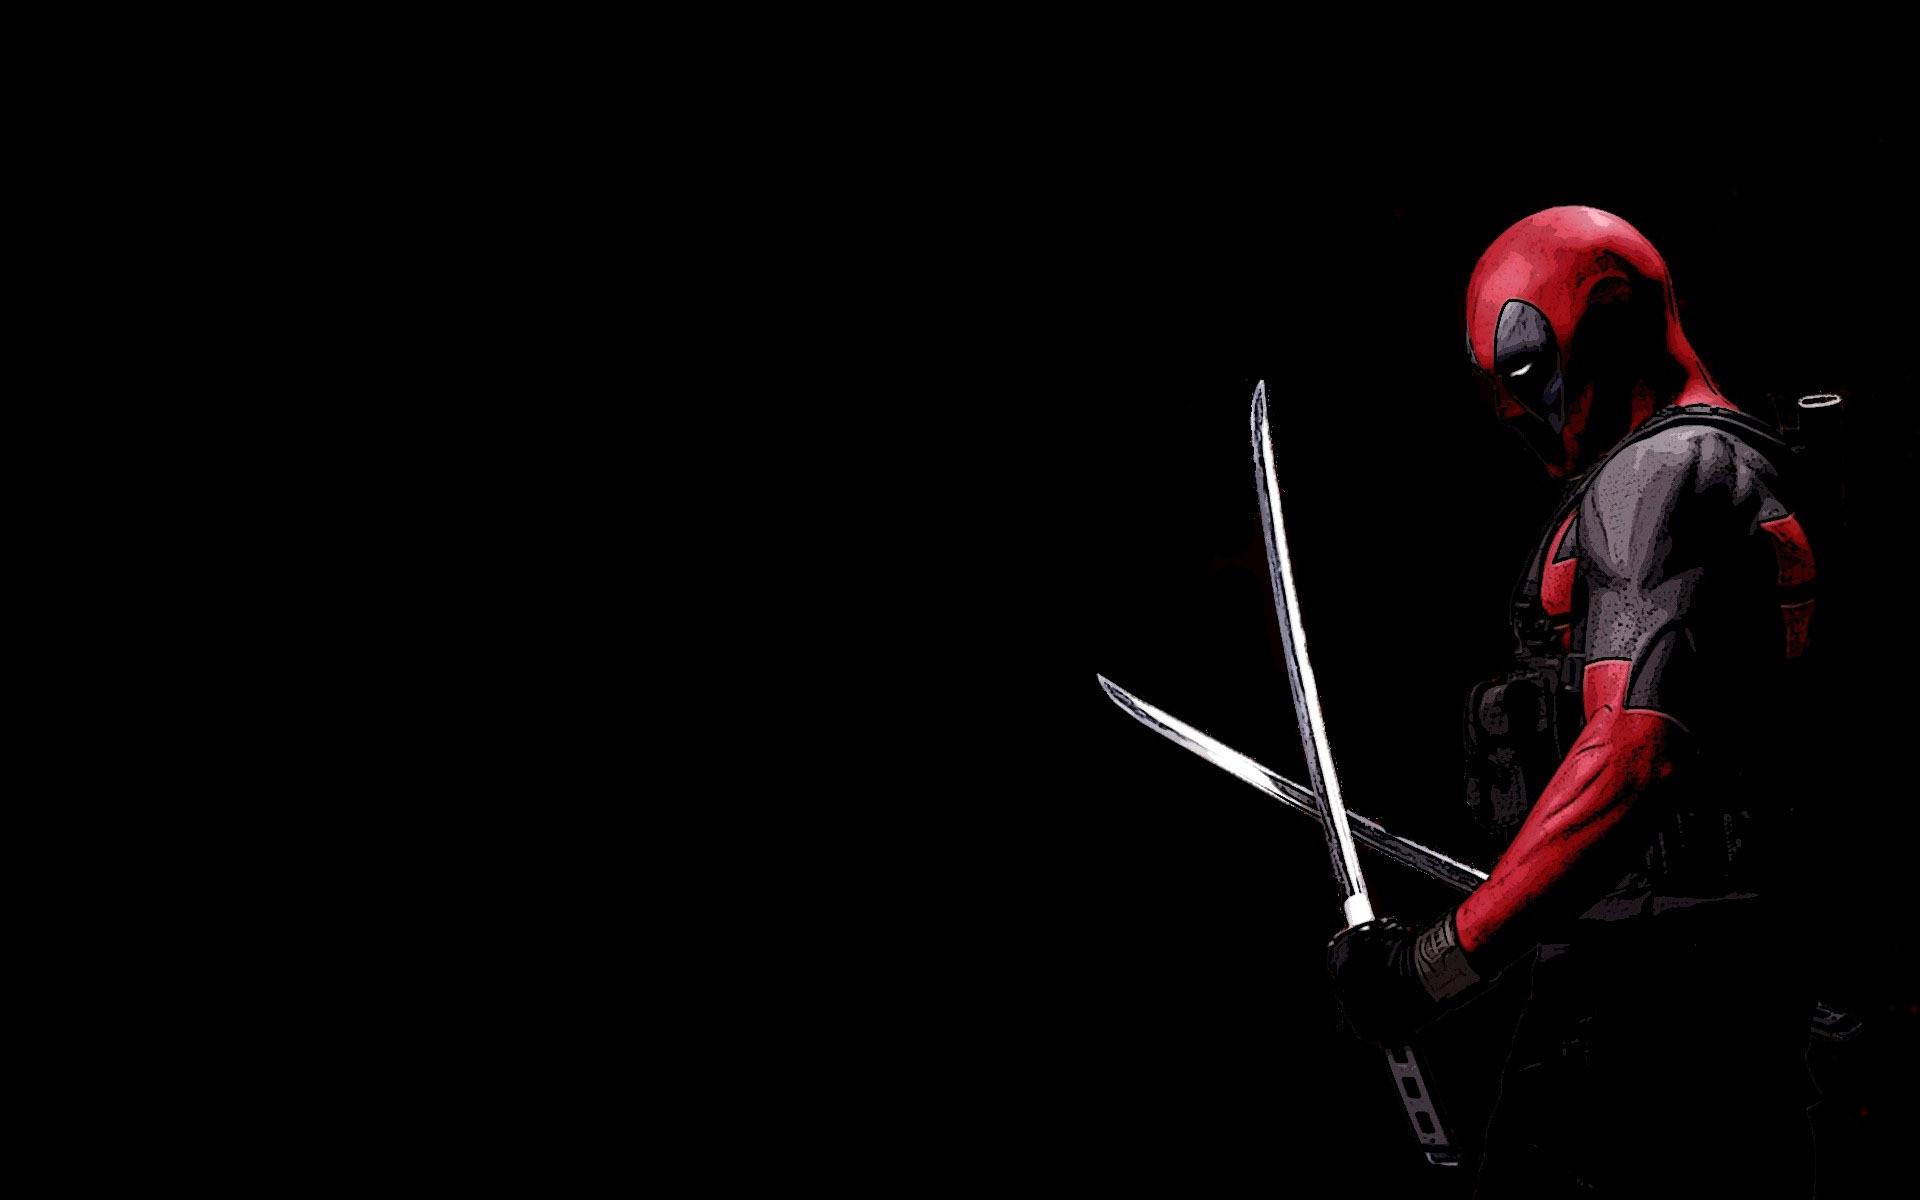 2092x1080 Heroes Comics Deadpool Hero Battles Spiderman Fantasy Wallpaper